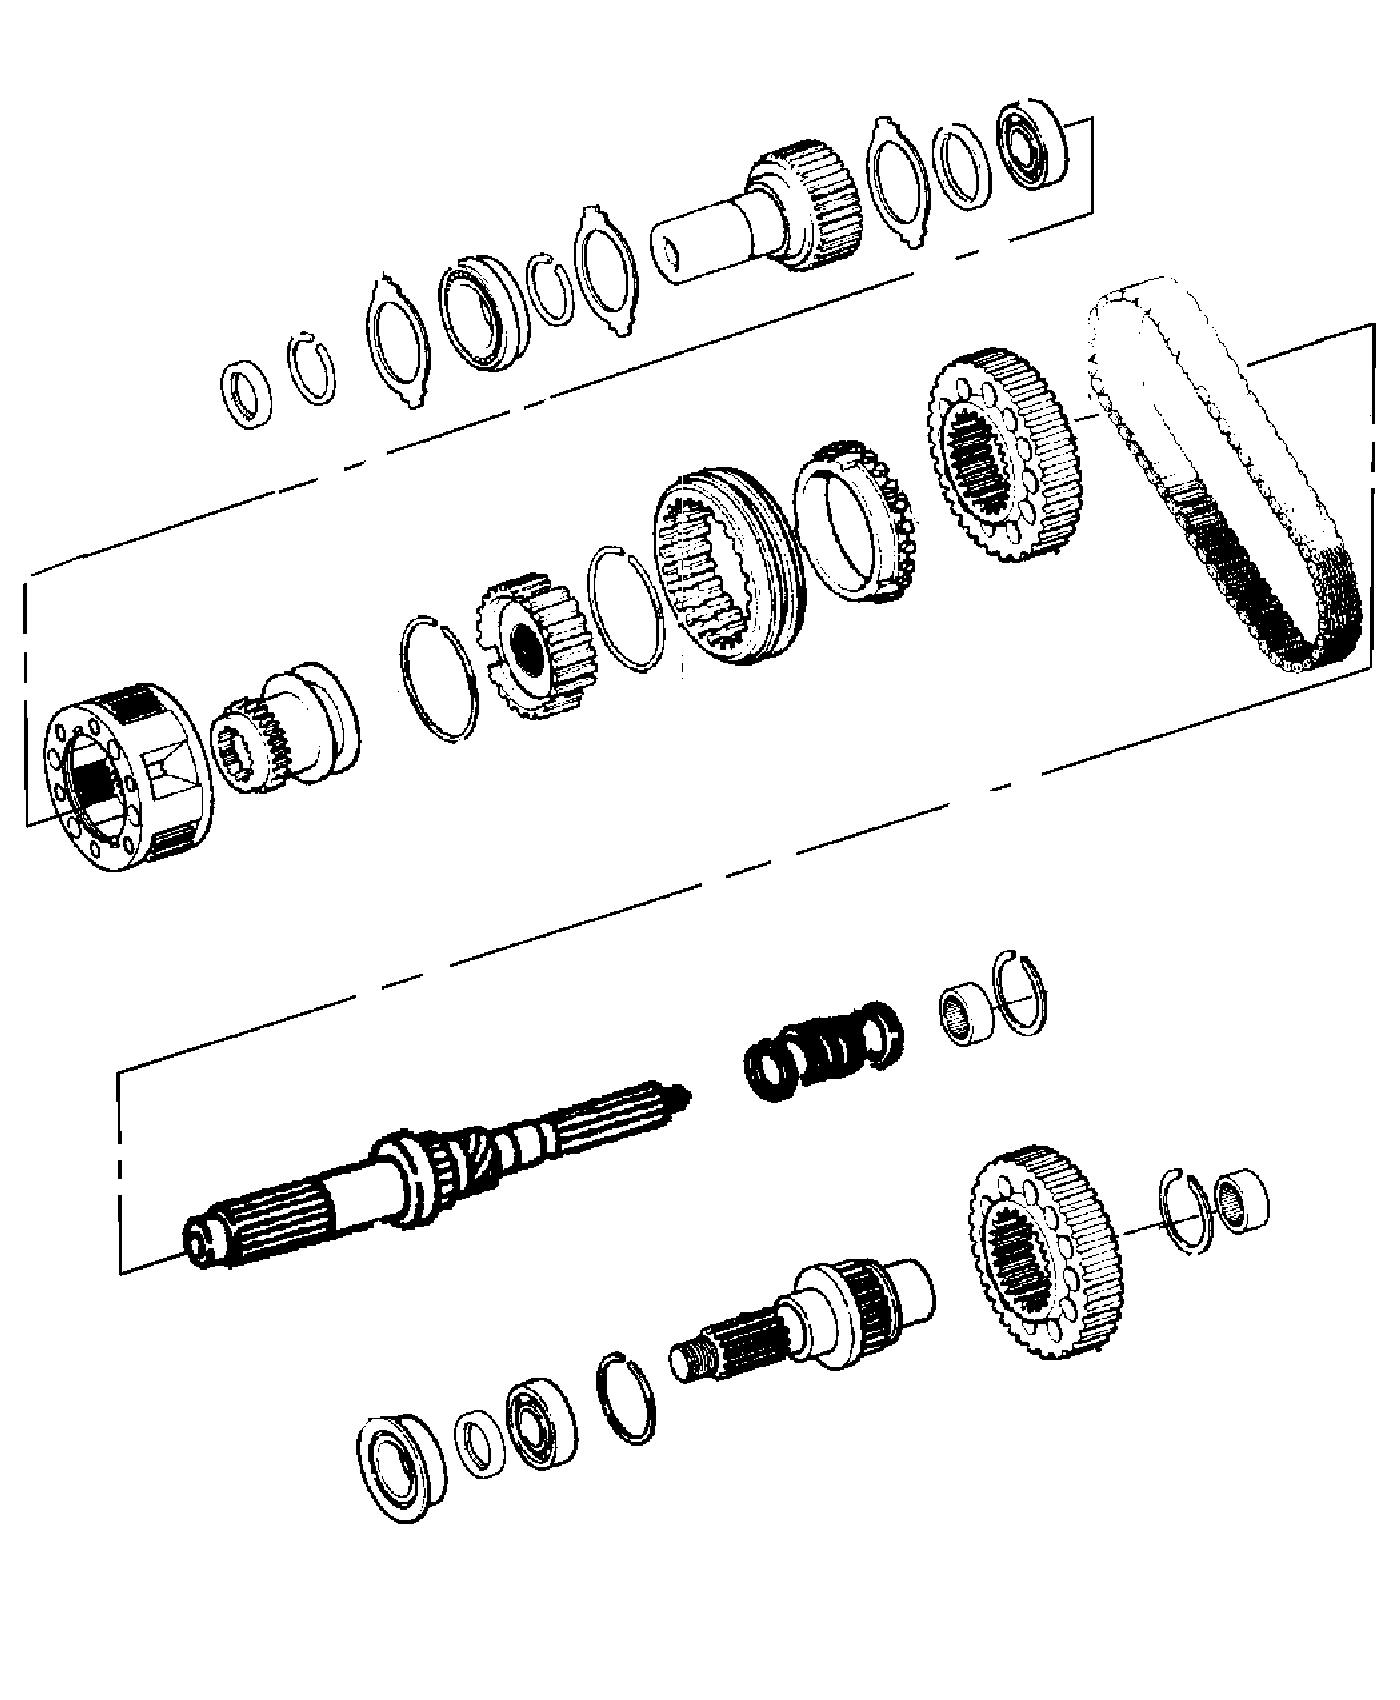 2011 Jeep Liberty Output shaft. Transfer case. Gear, train